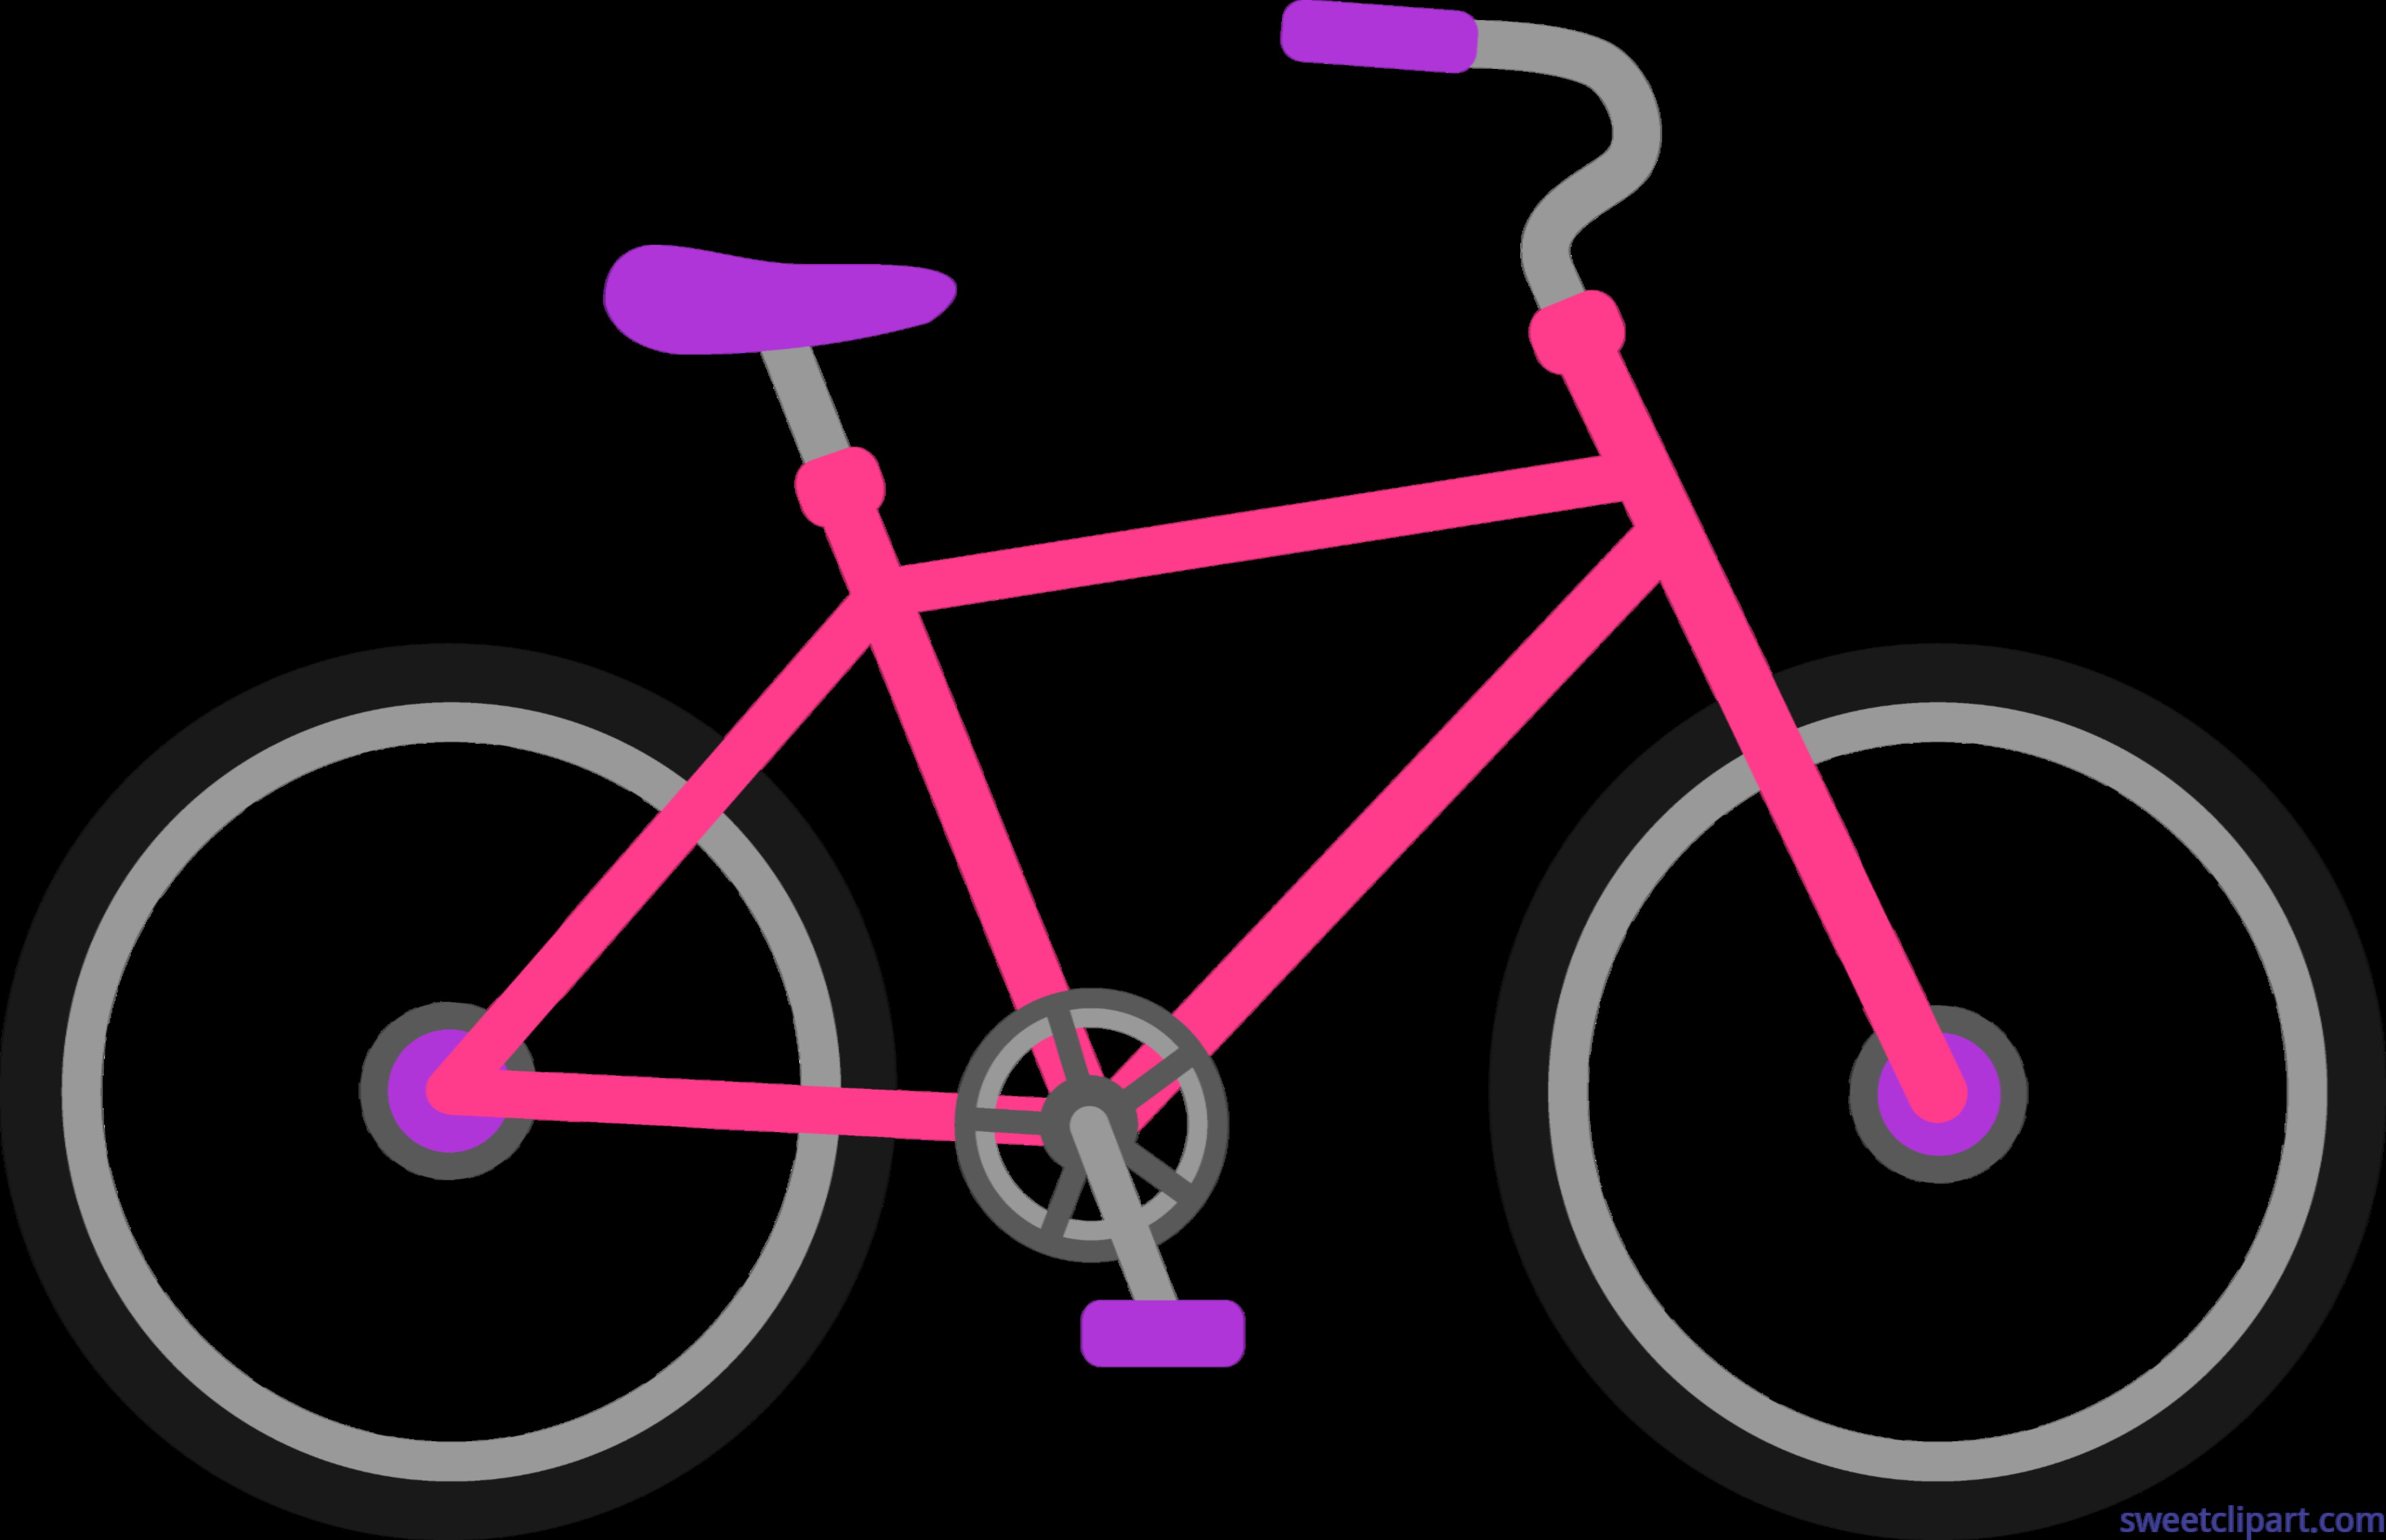 Cycle clipart vehicle. Pink bike clip art